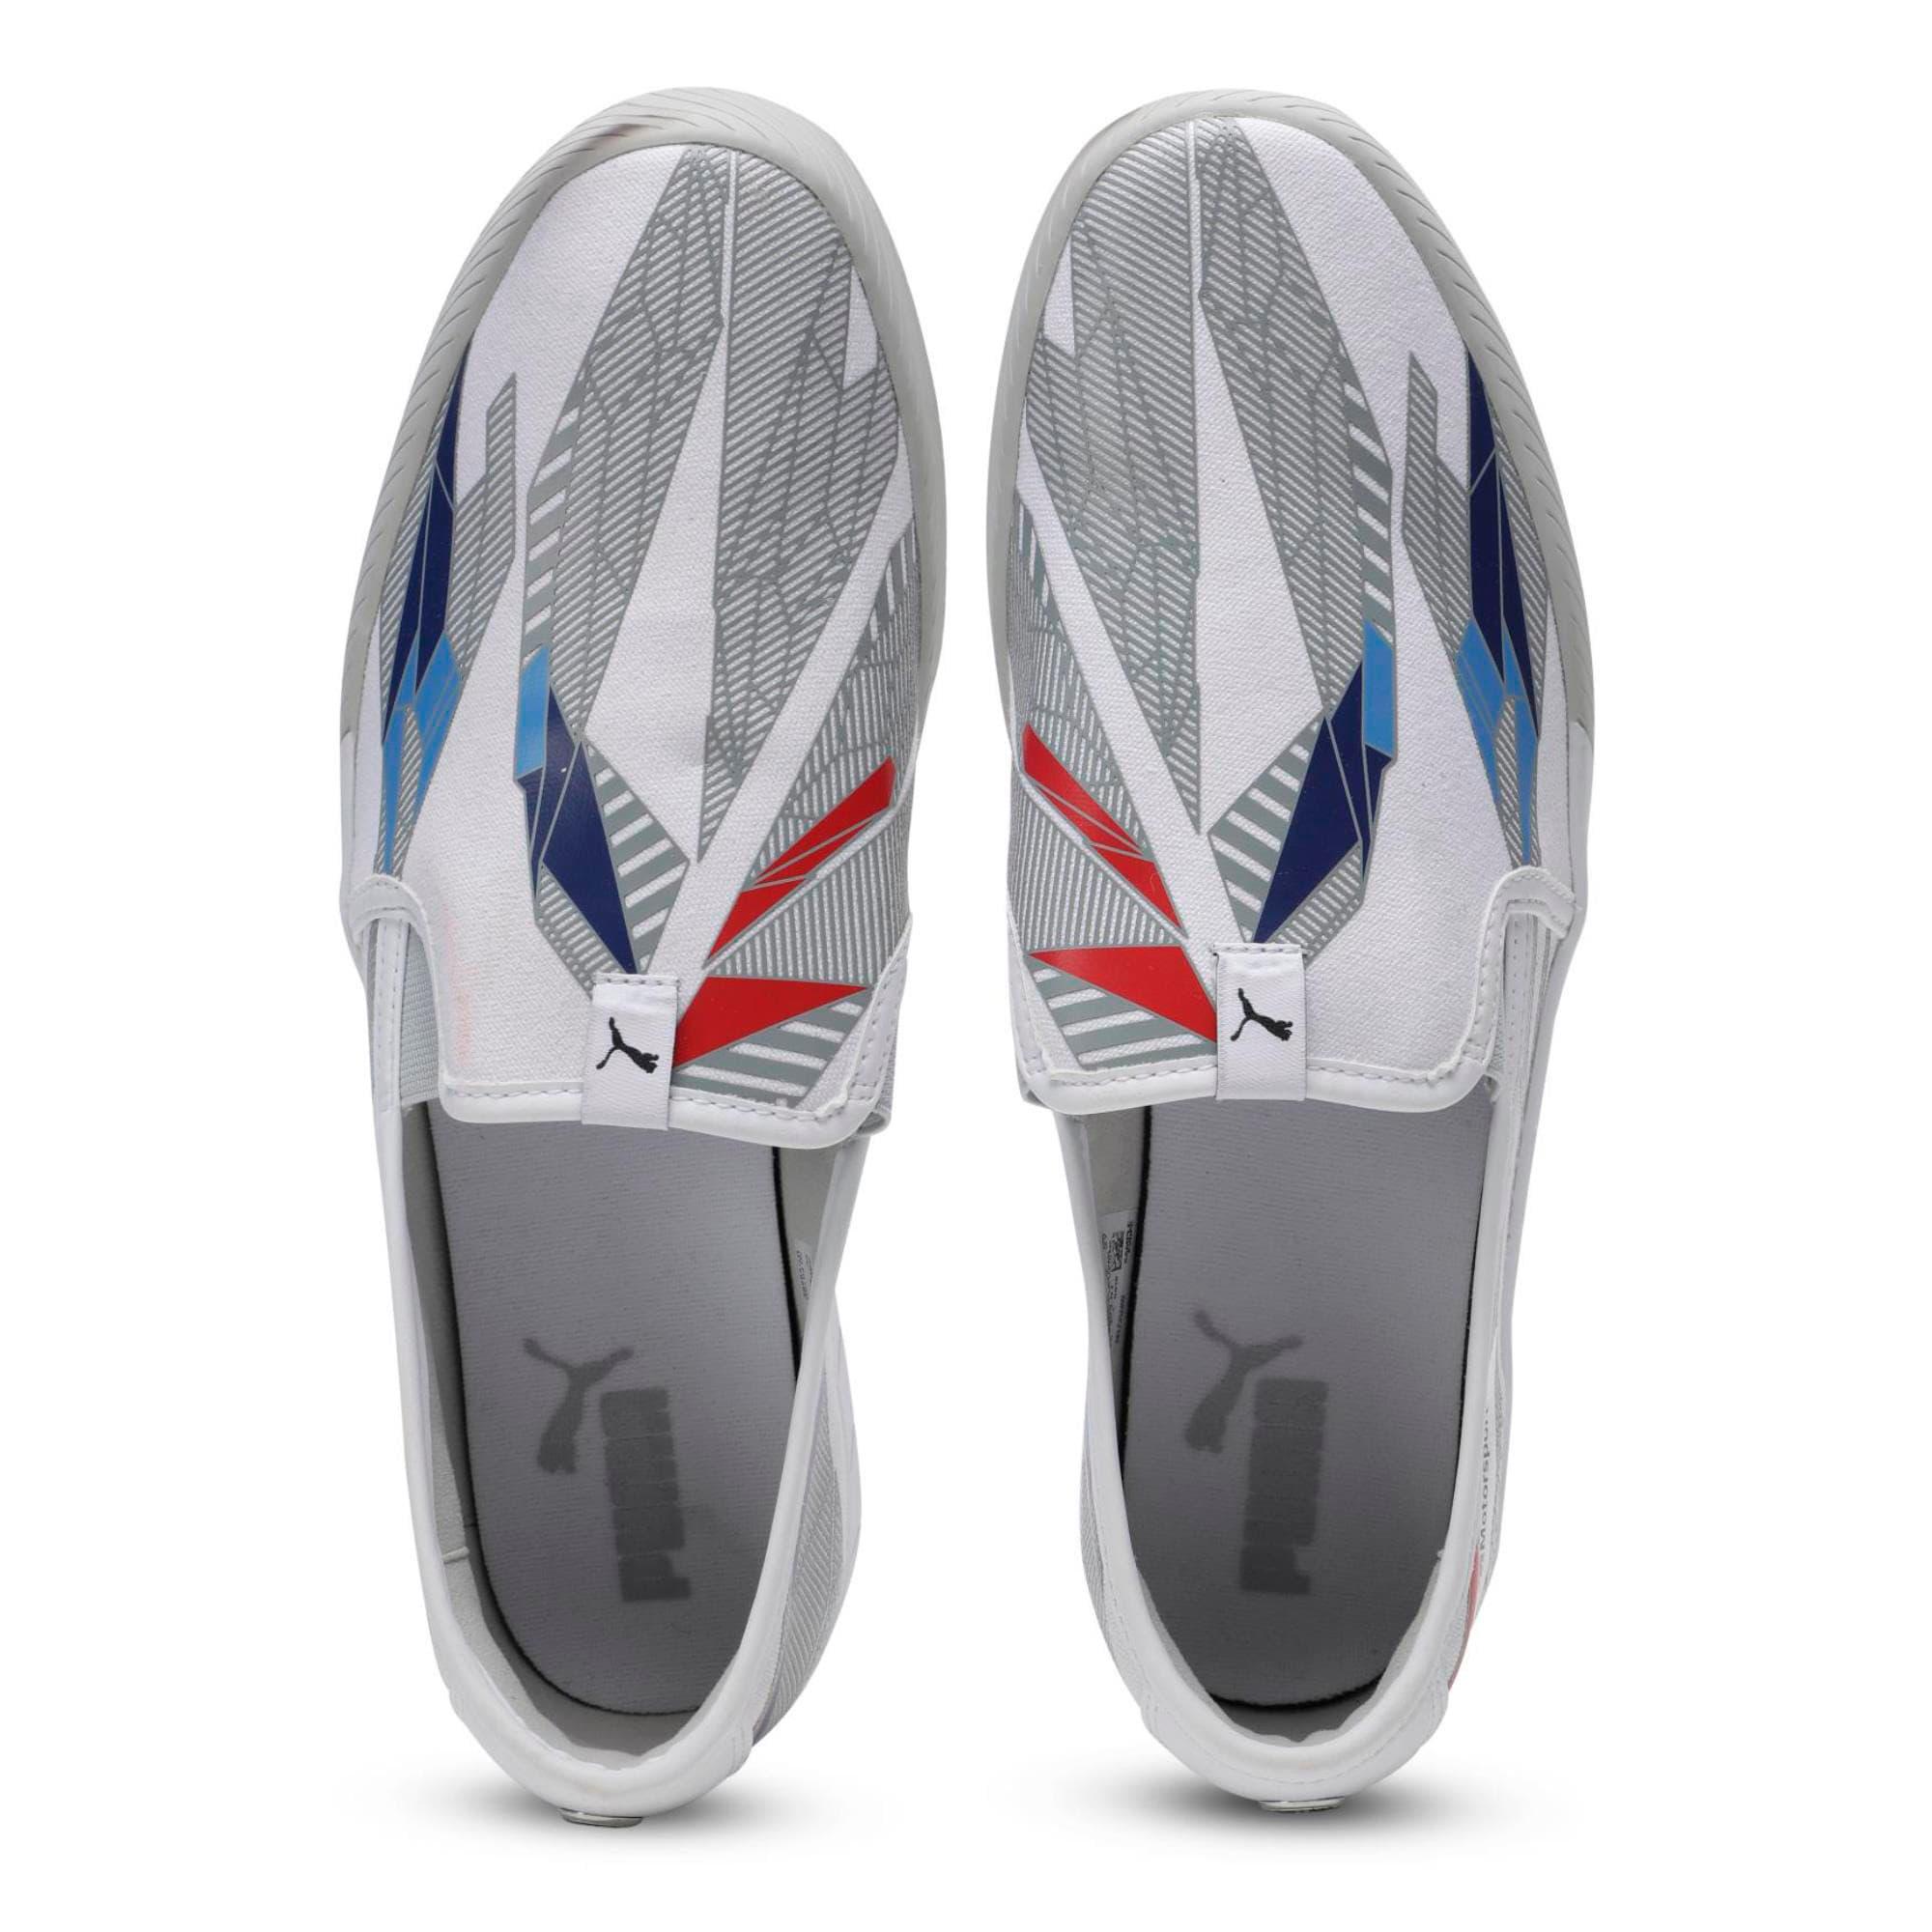 Thumbnail 8 of BMW M Slip-On Track Shoes, Puma White-Gray Violet, medium-IND